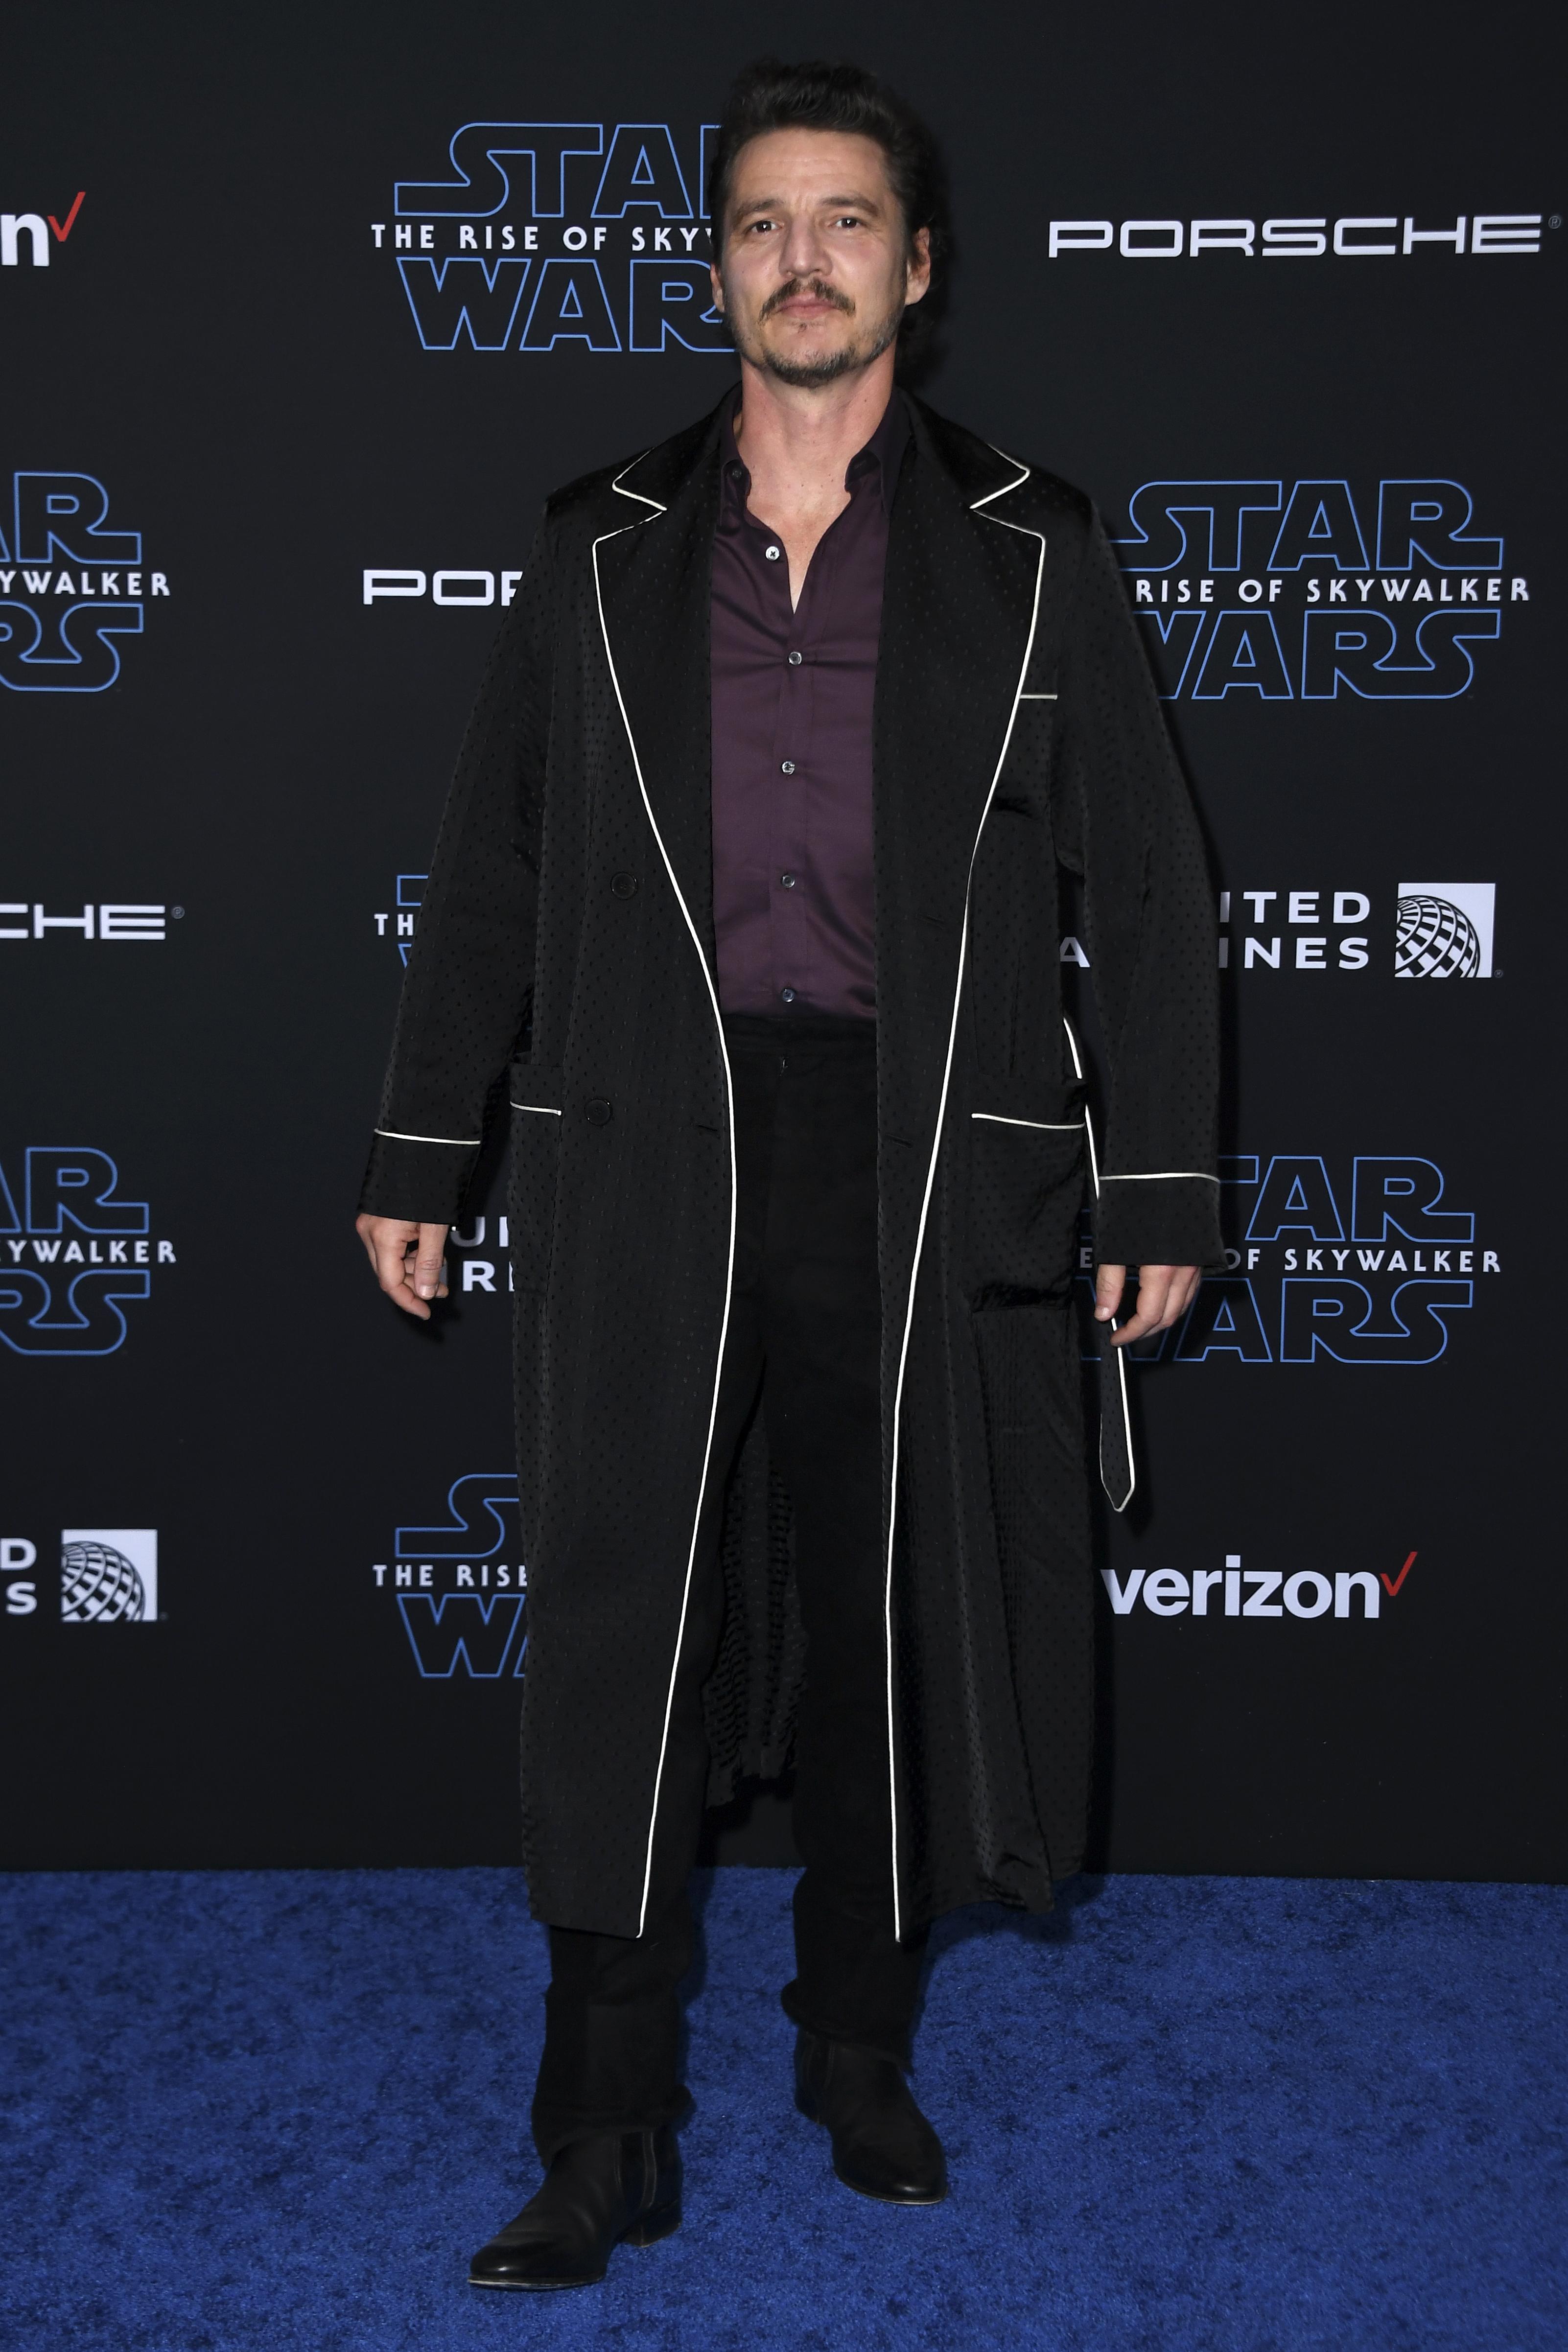 star wars the force awakens, looks, premiere